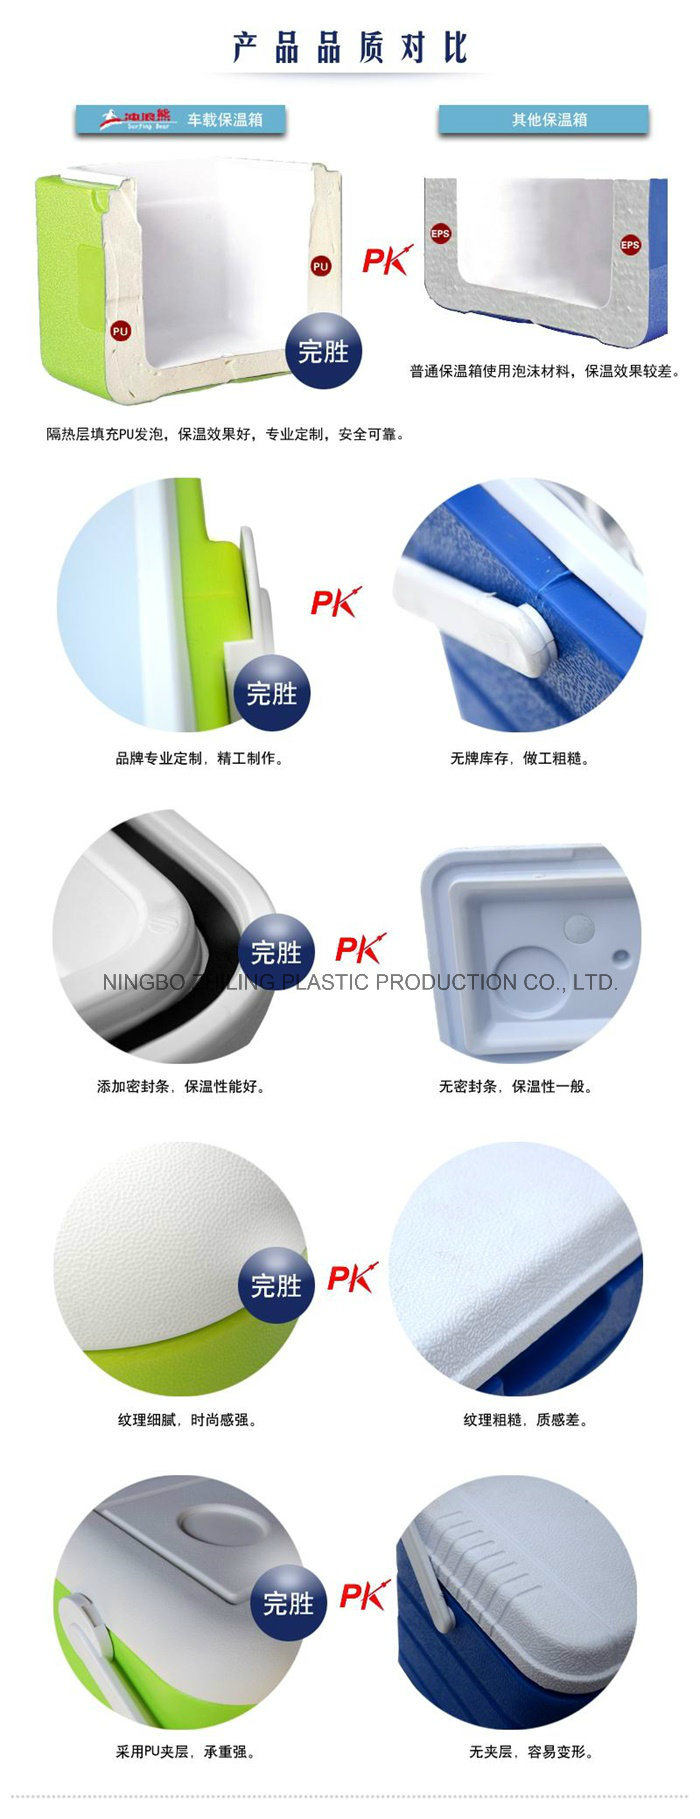 Ice Box, Plastic Box